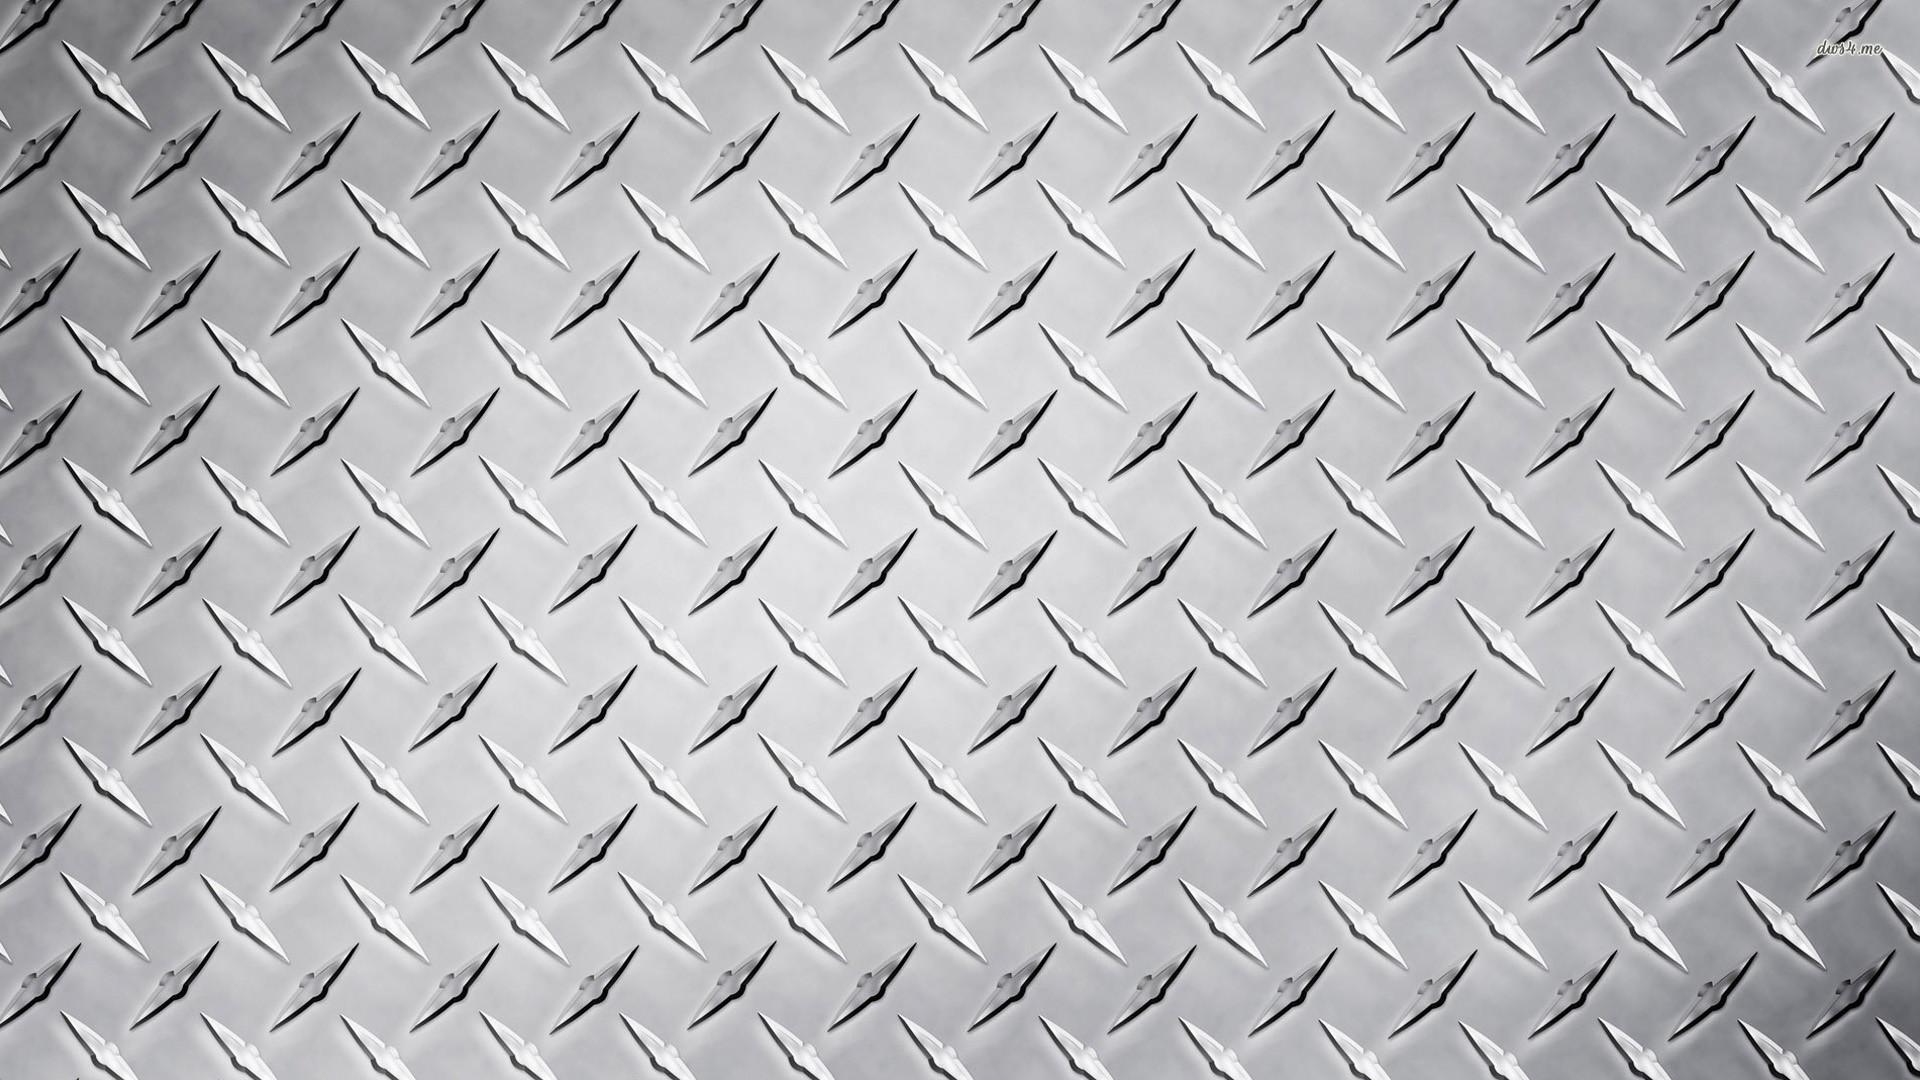 Silver Diamond Plate wallpaper https://deskbg.com/view/30525/